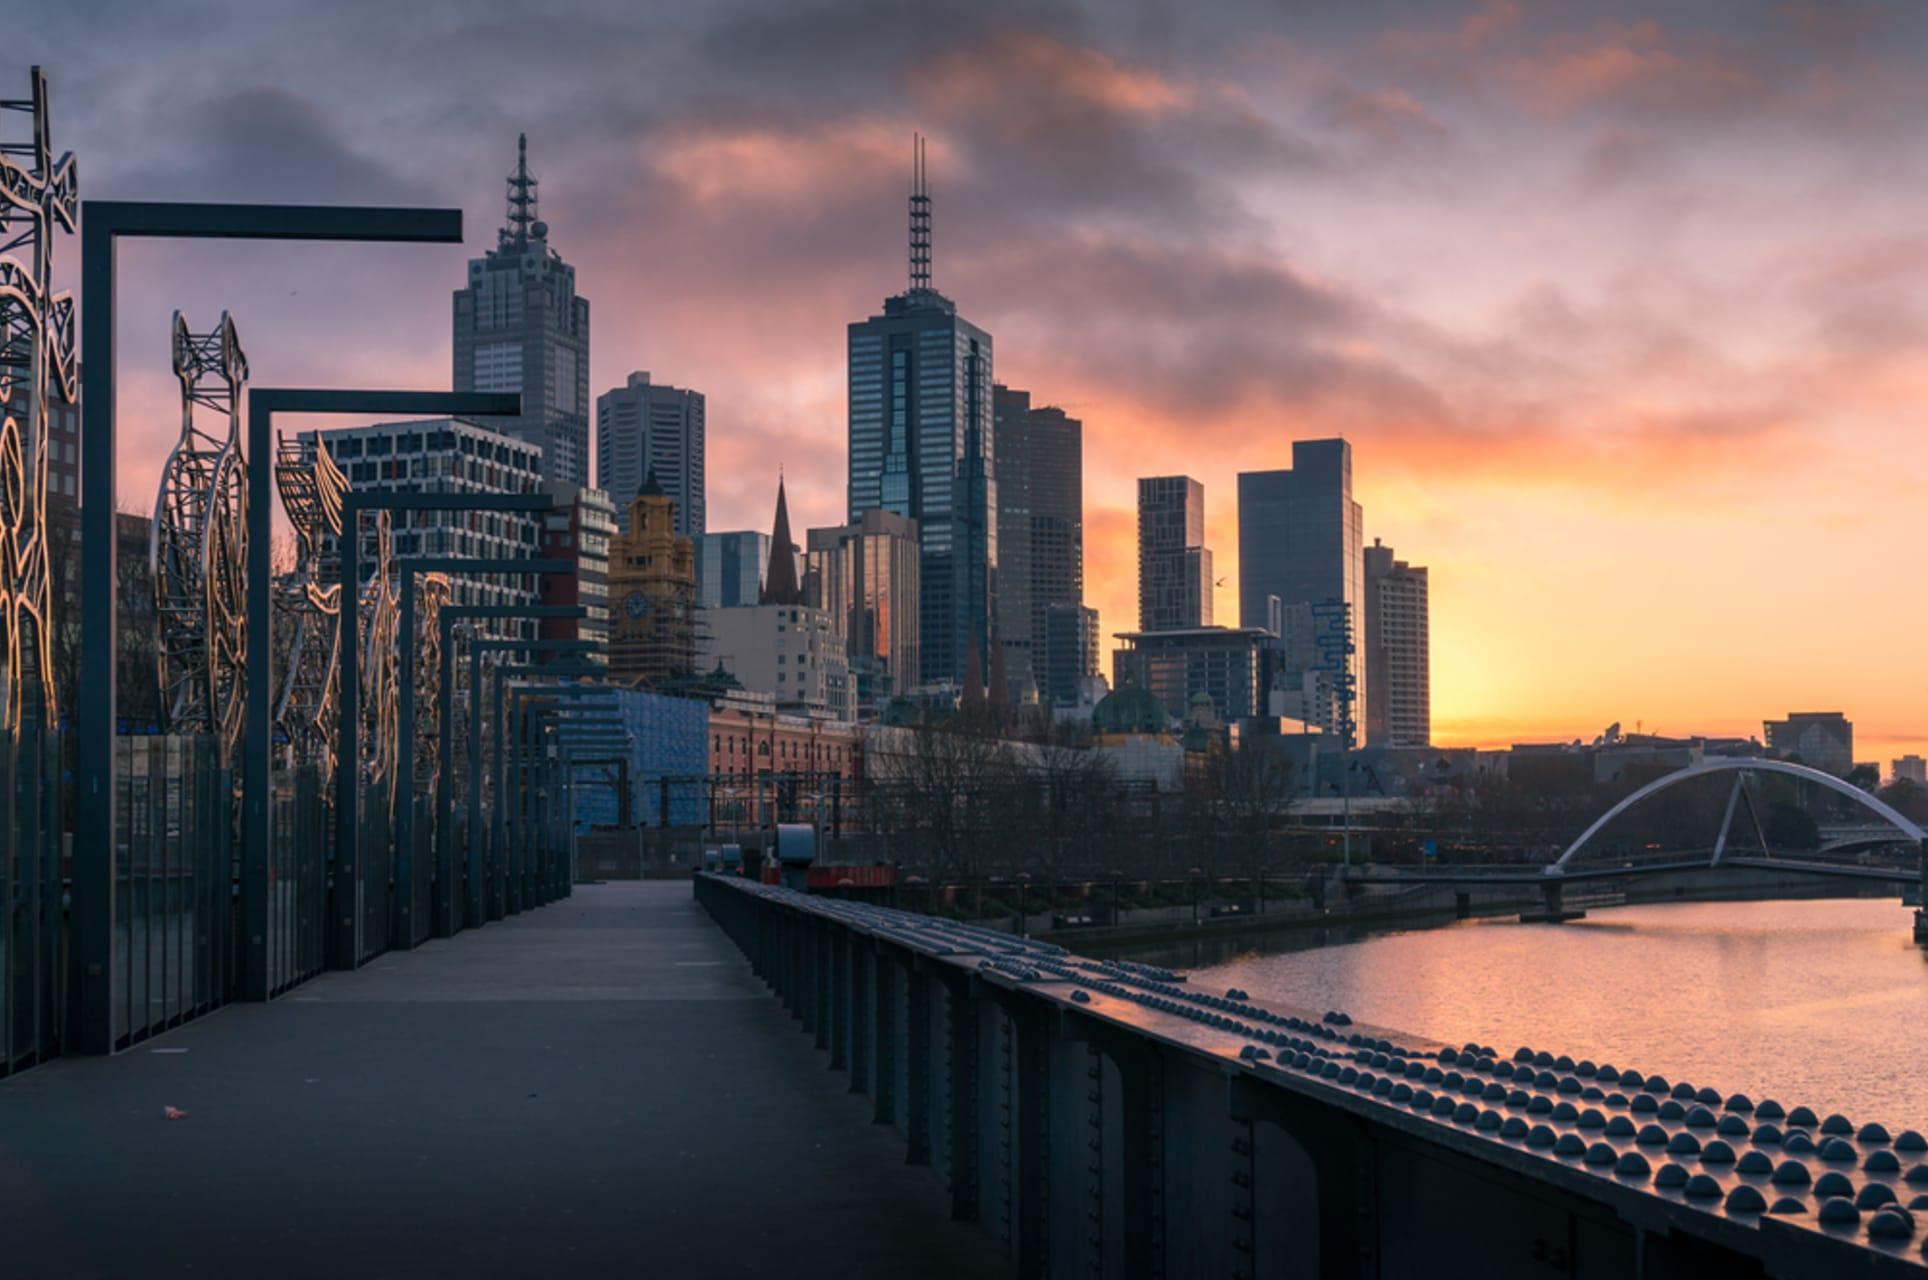 Melbourne - Art Special: Australia's Migration History Told Through Art